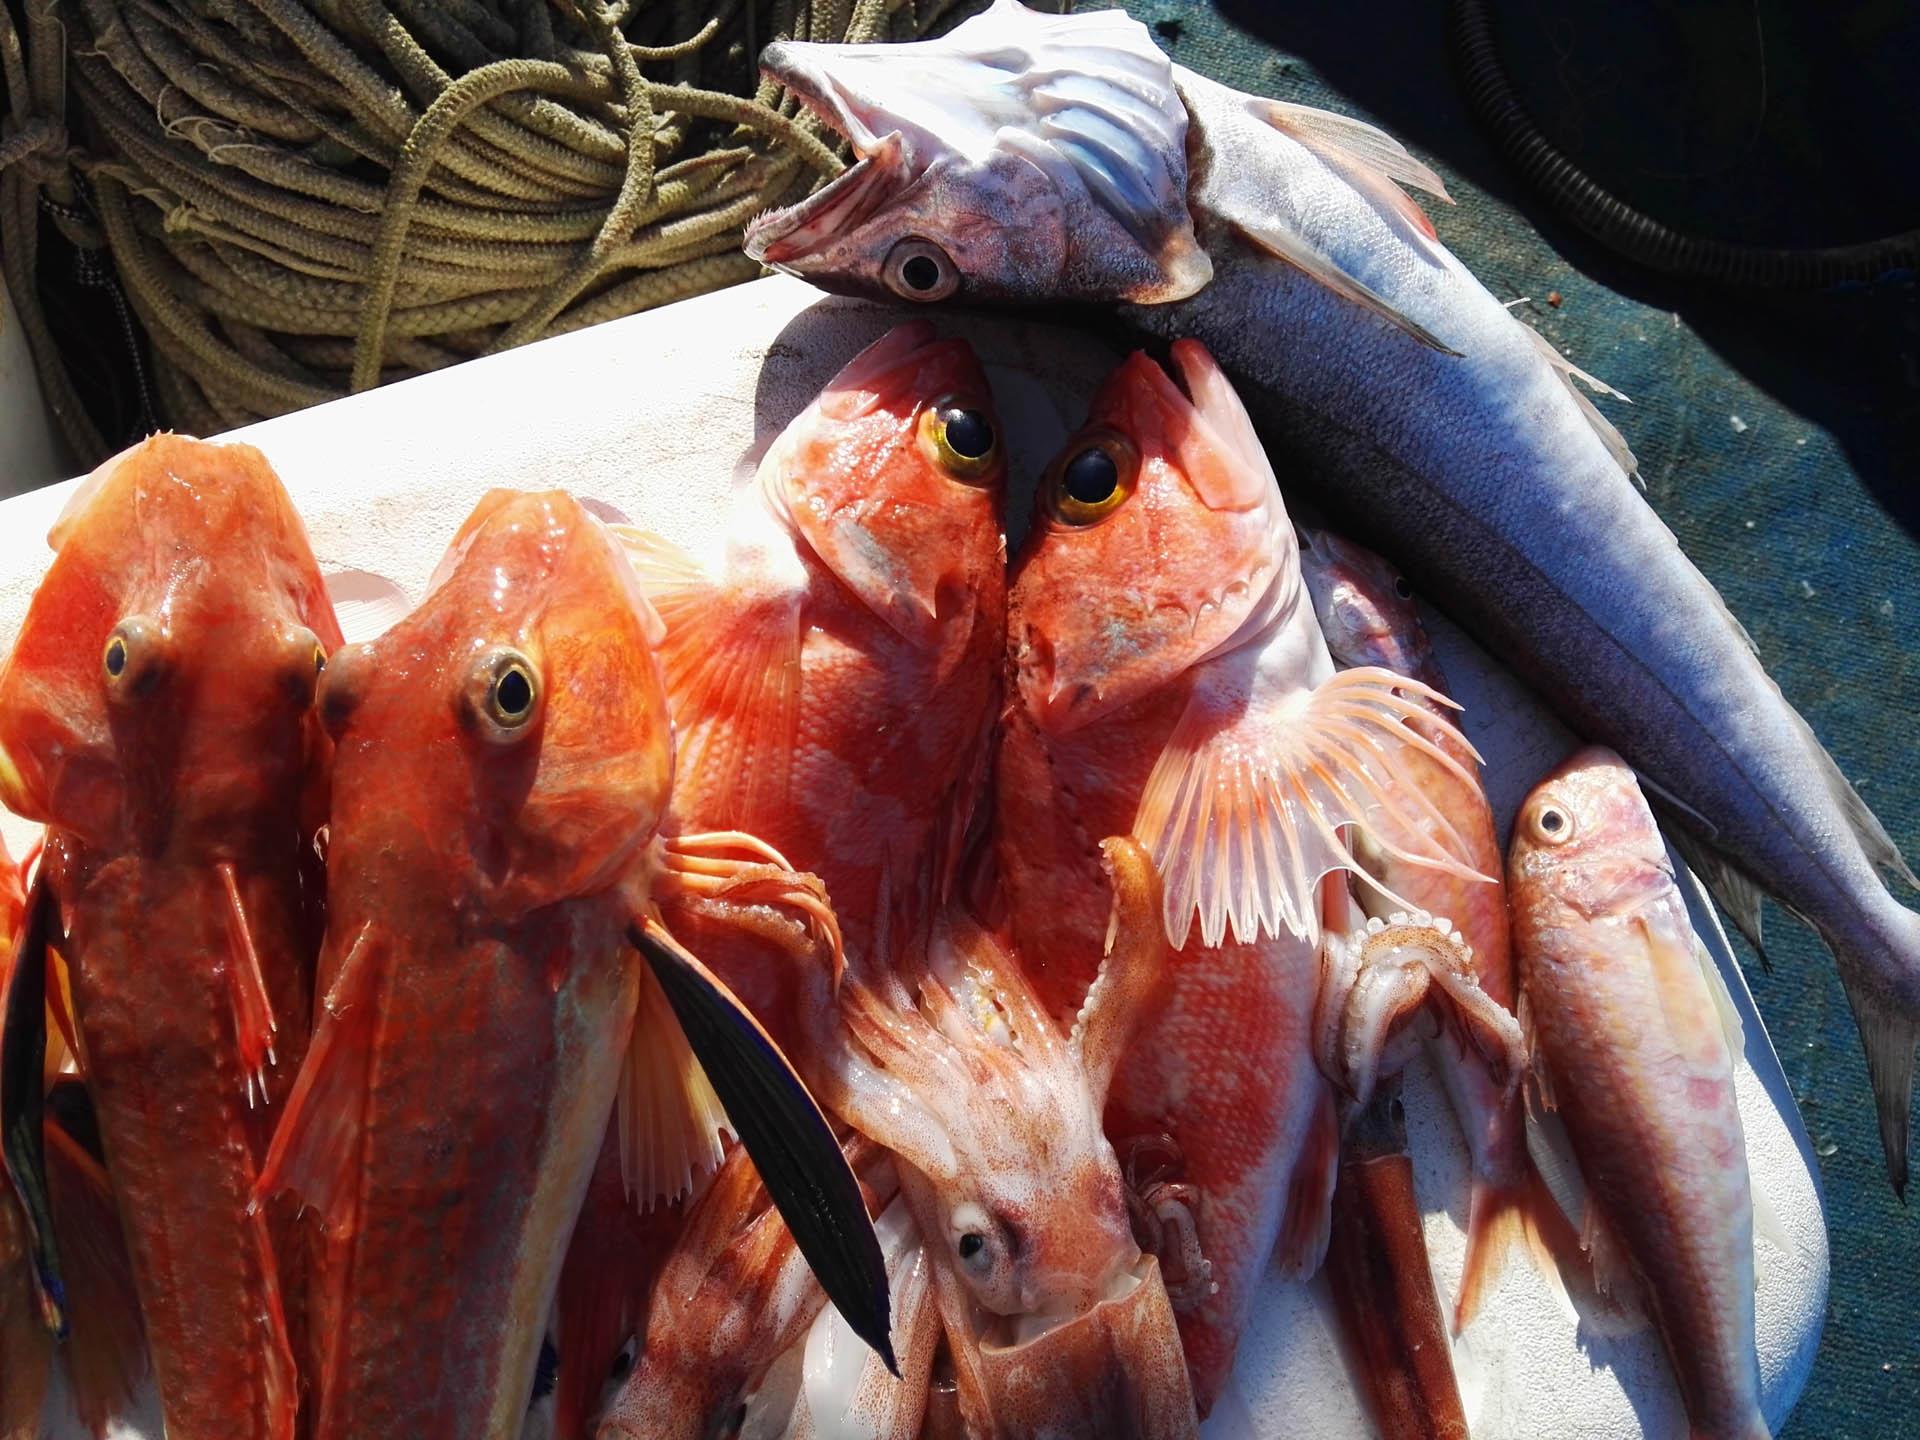 Fishing experience in Capri